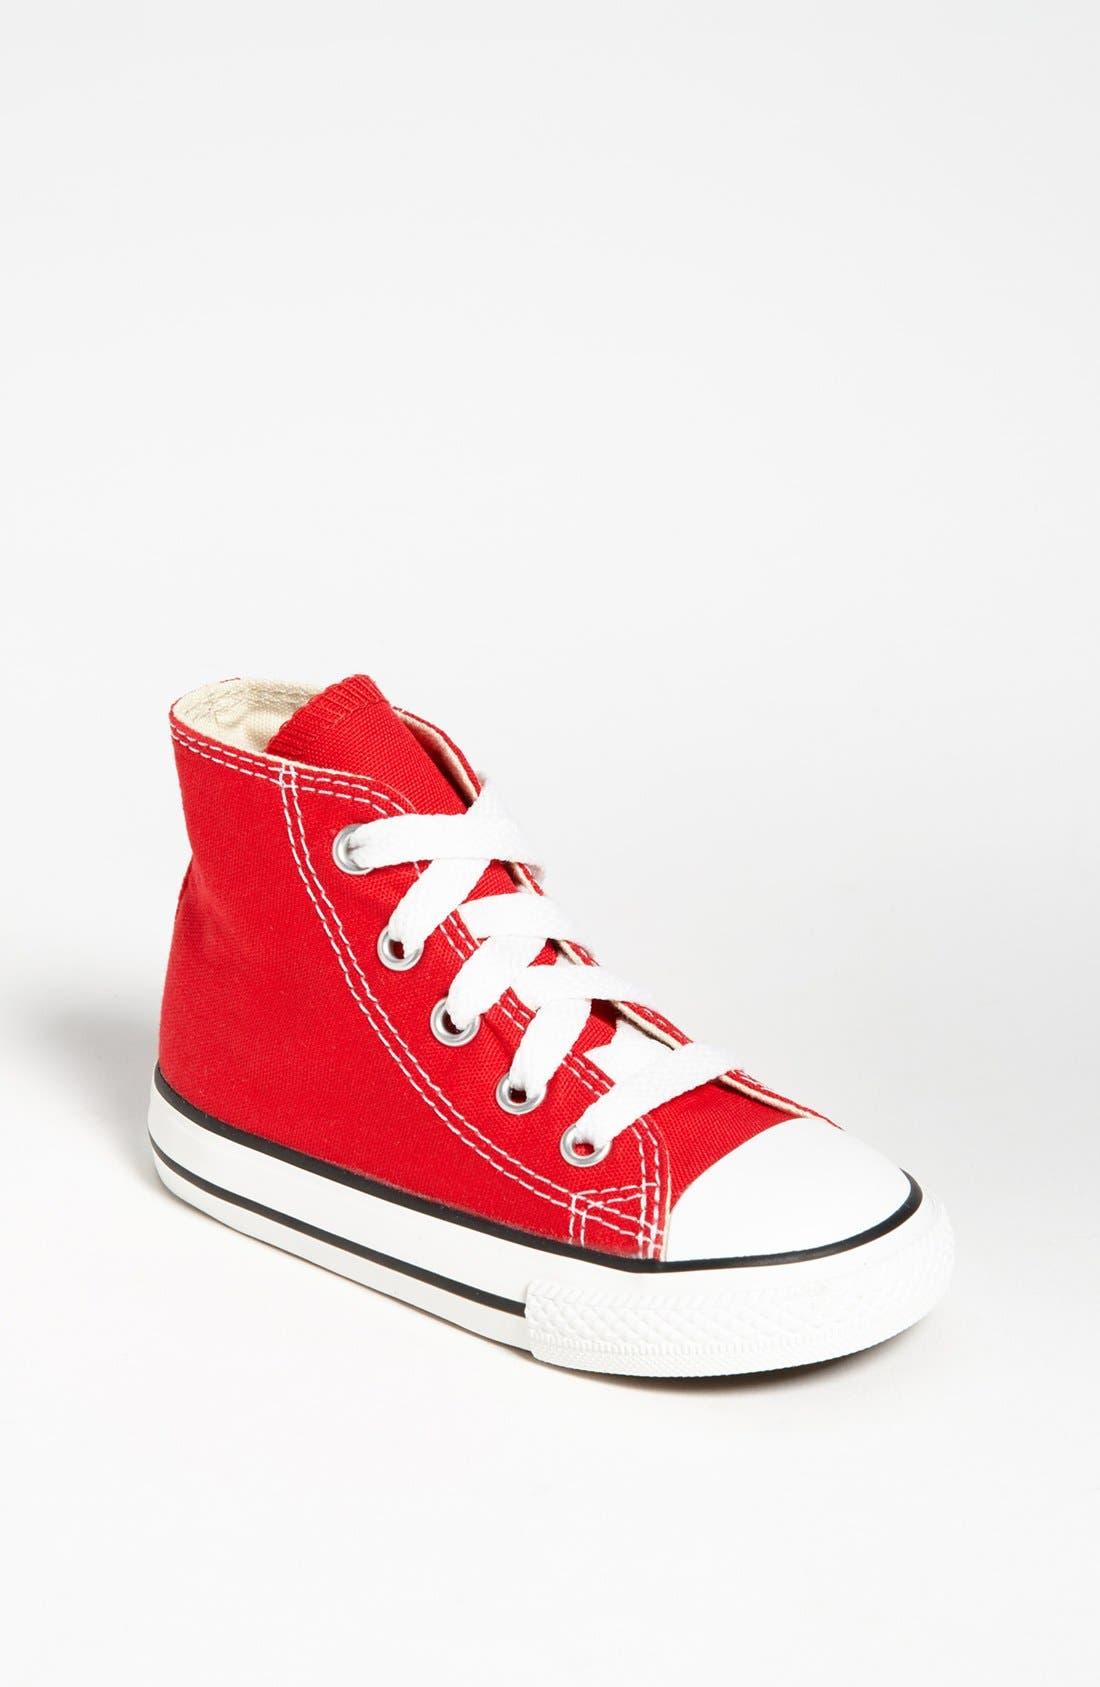 34eb39e9b143 Converse All Star High Top Sneaker